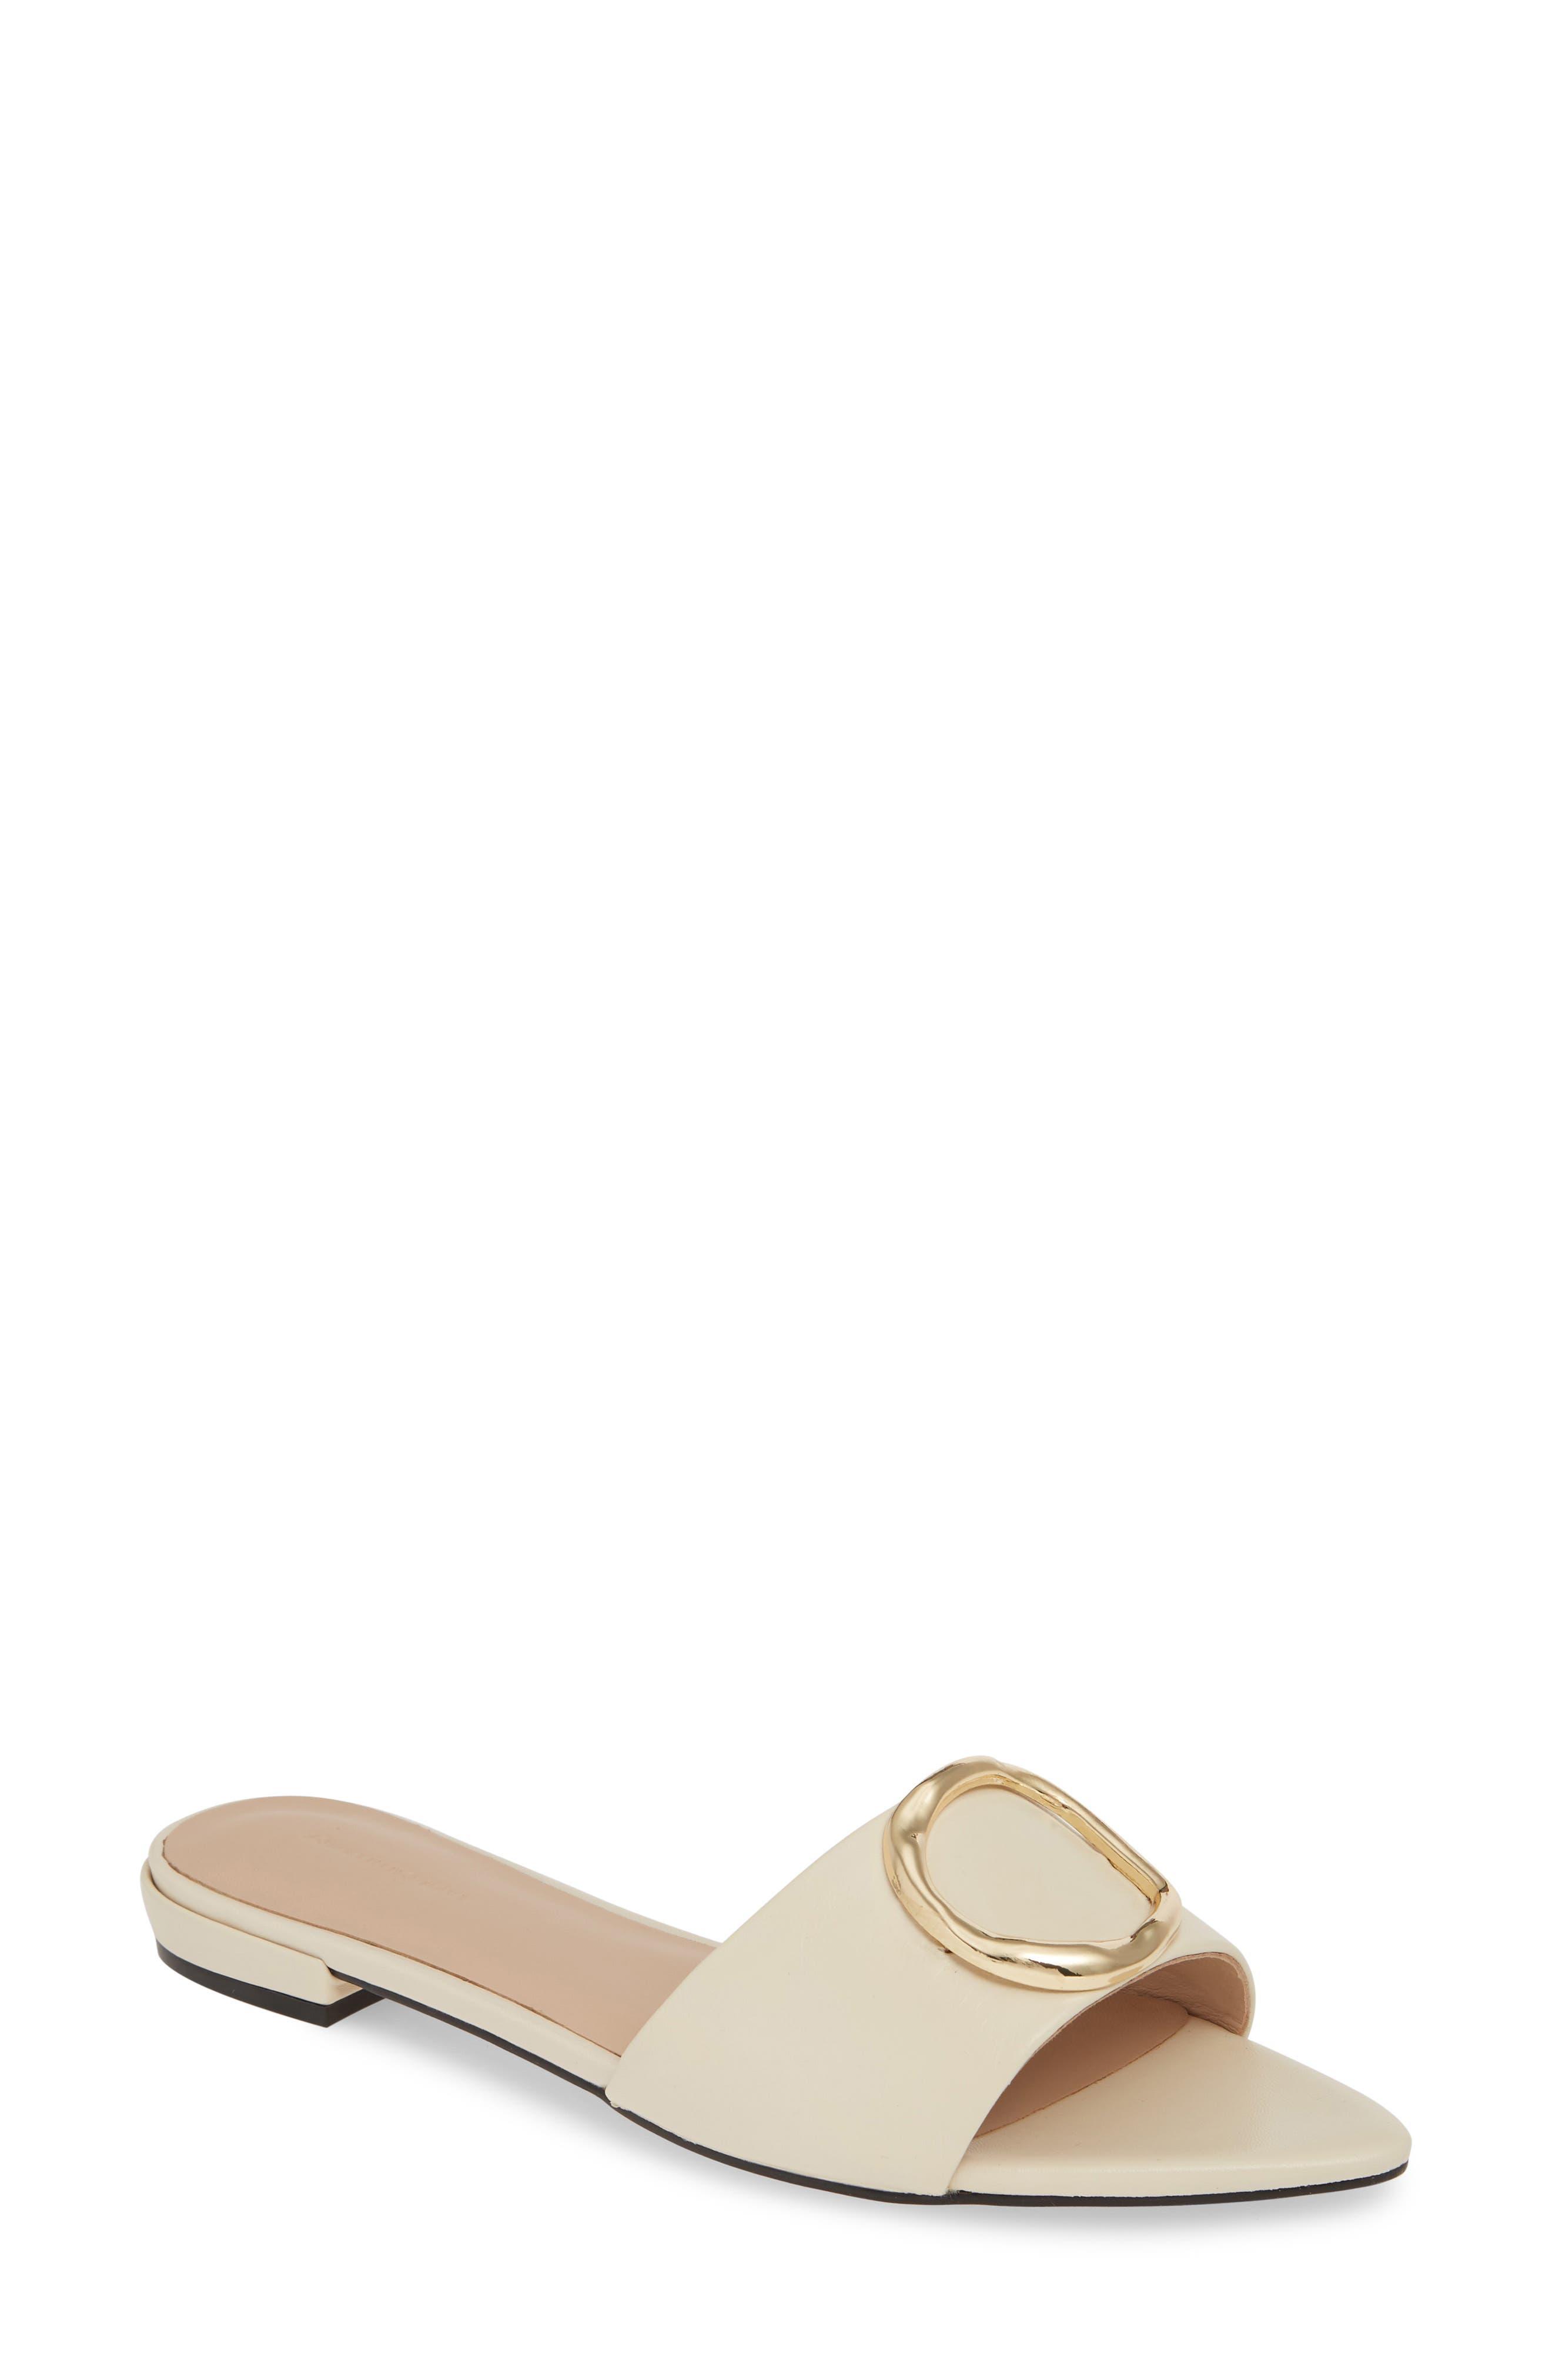 SOMETHING NAVY Cassie Pointy Toe Slide Sandal, Main, color, BONE LEATHER